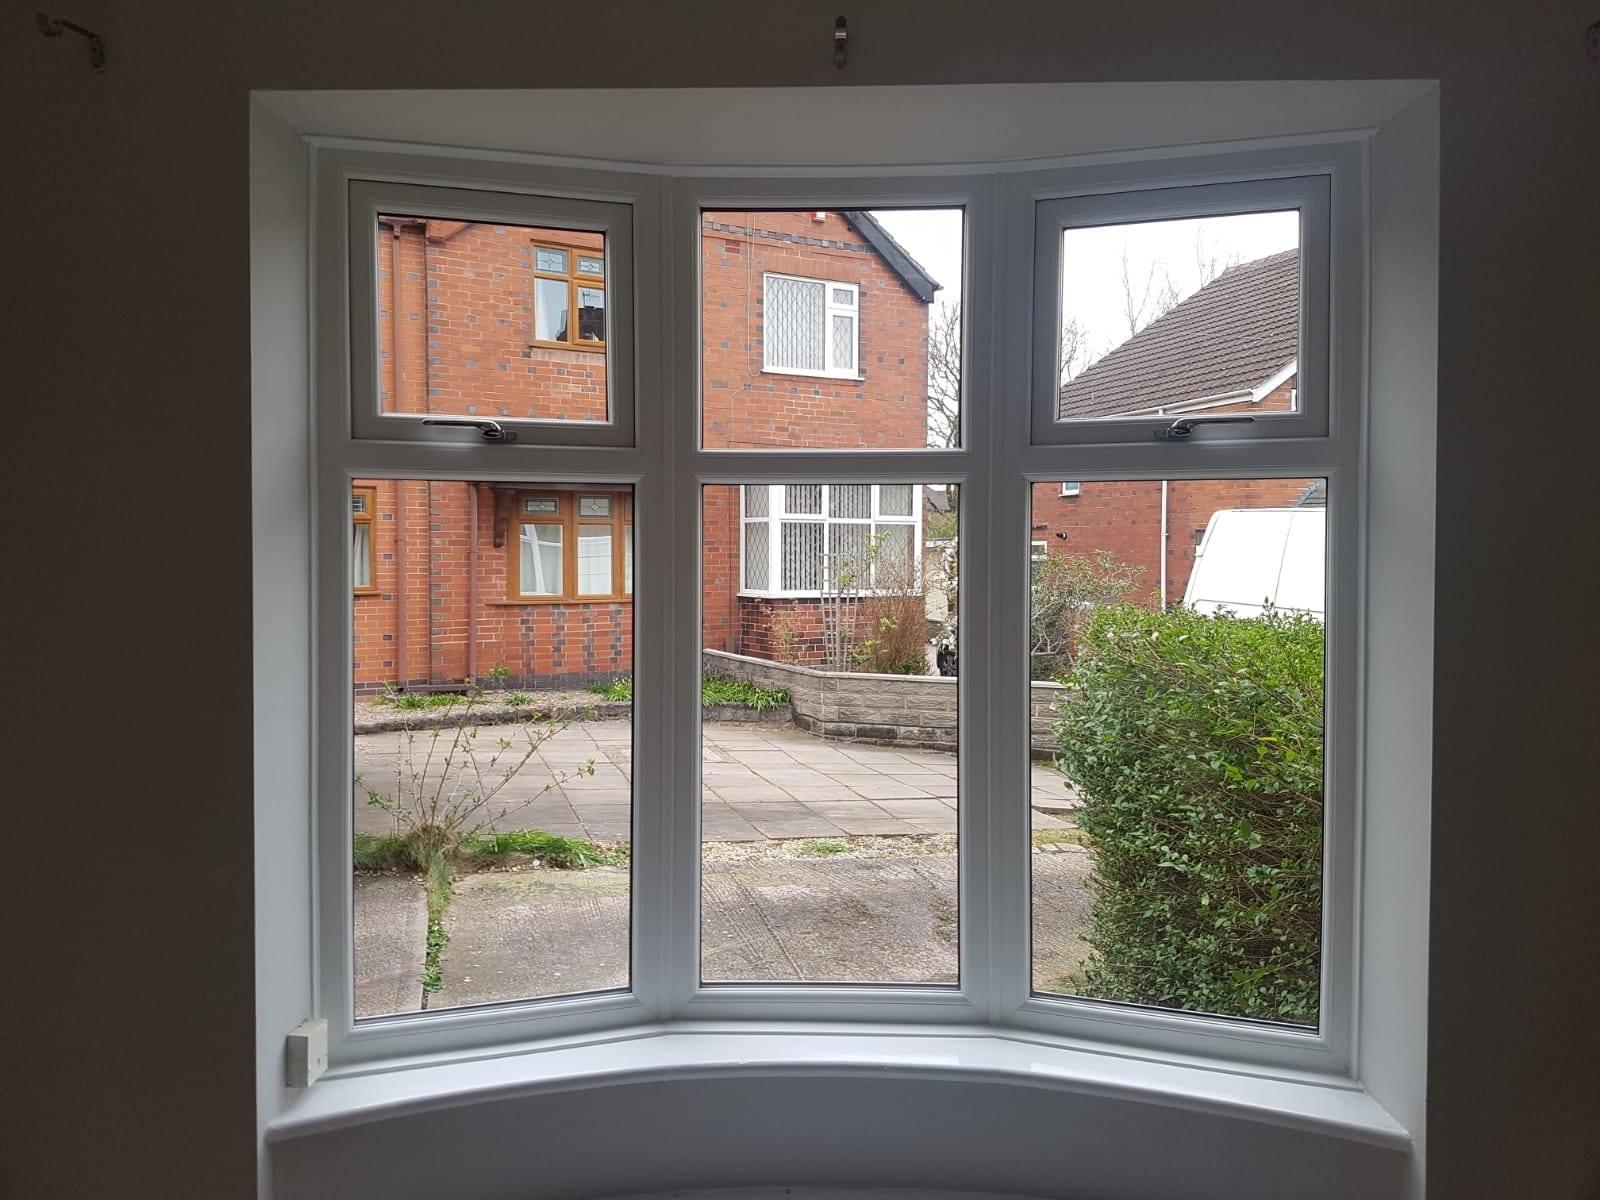 3 SECTION BAY WINDOW INTERNAL